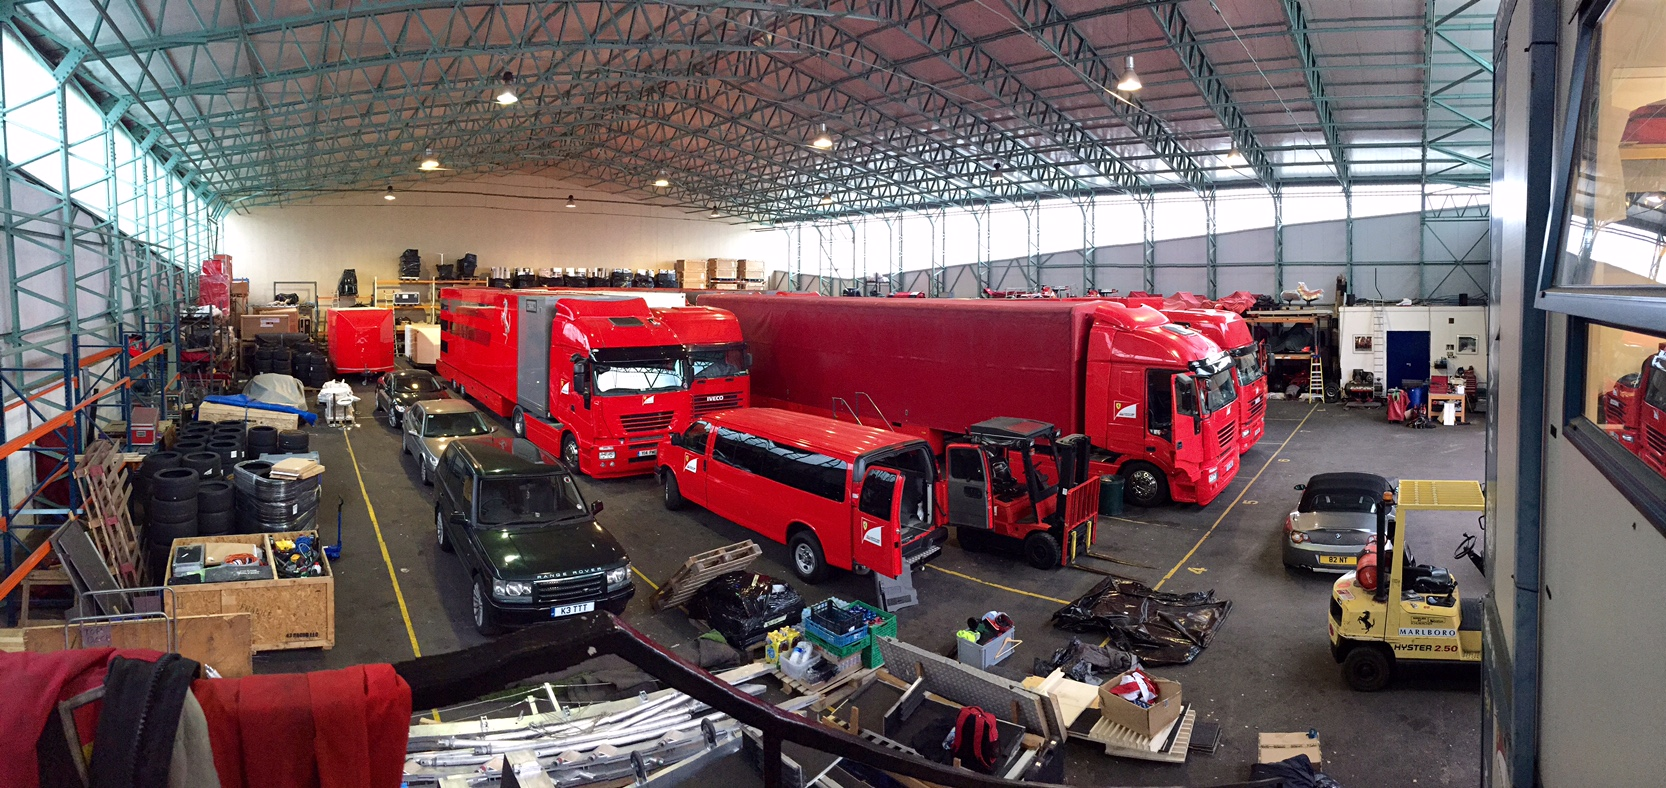 The Procar F1 Paddock Complex crew finishing off the European season